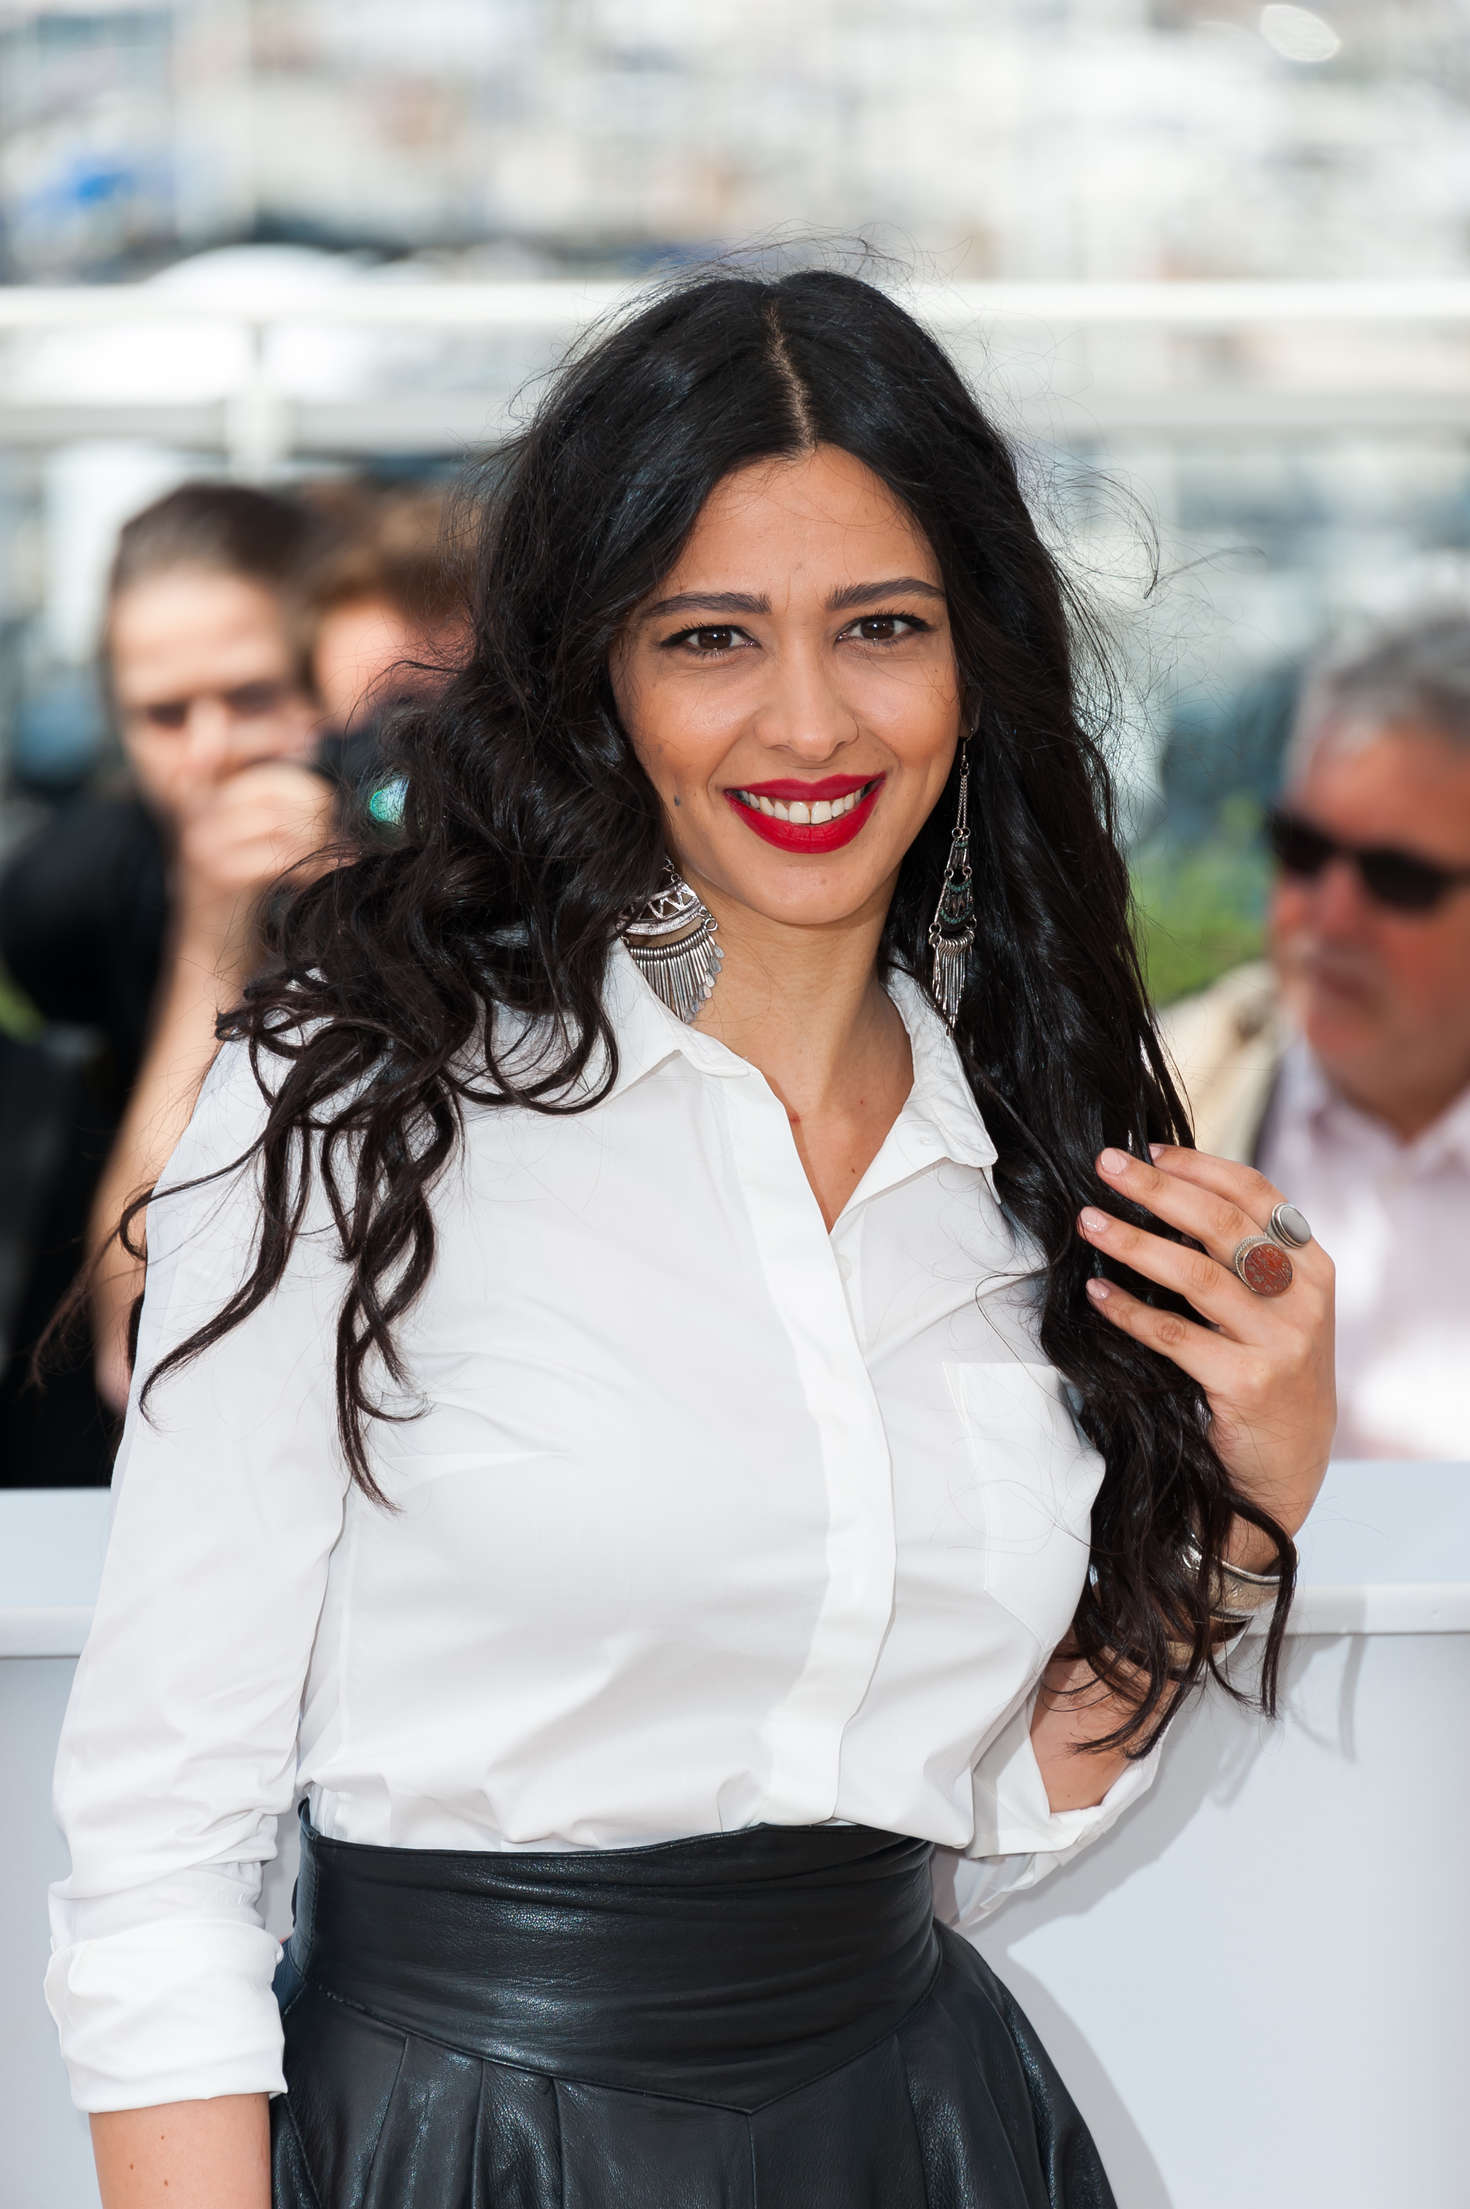 Maisa Abd Elhadi attends Personal Affairs Photocall